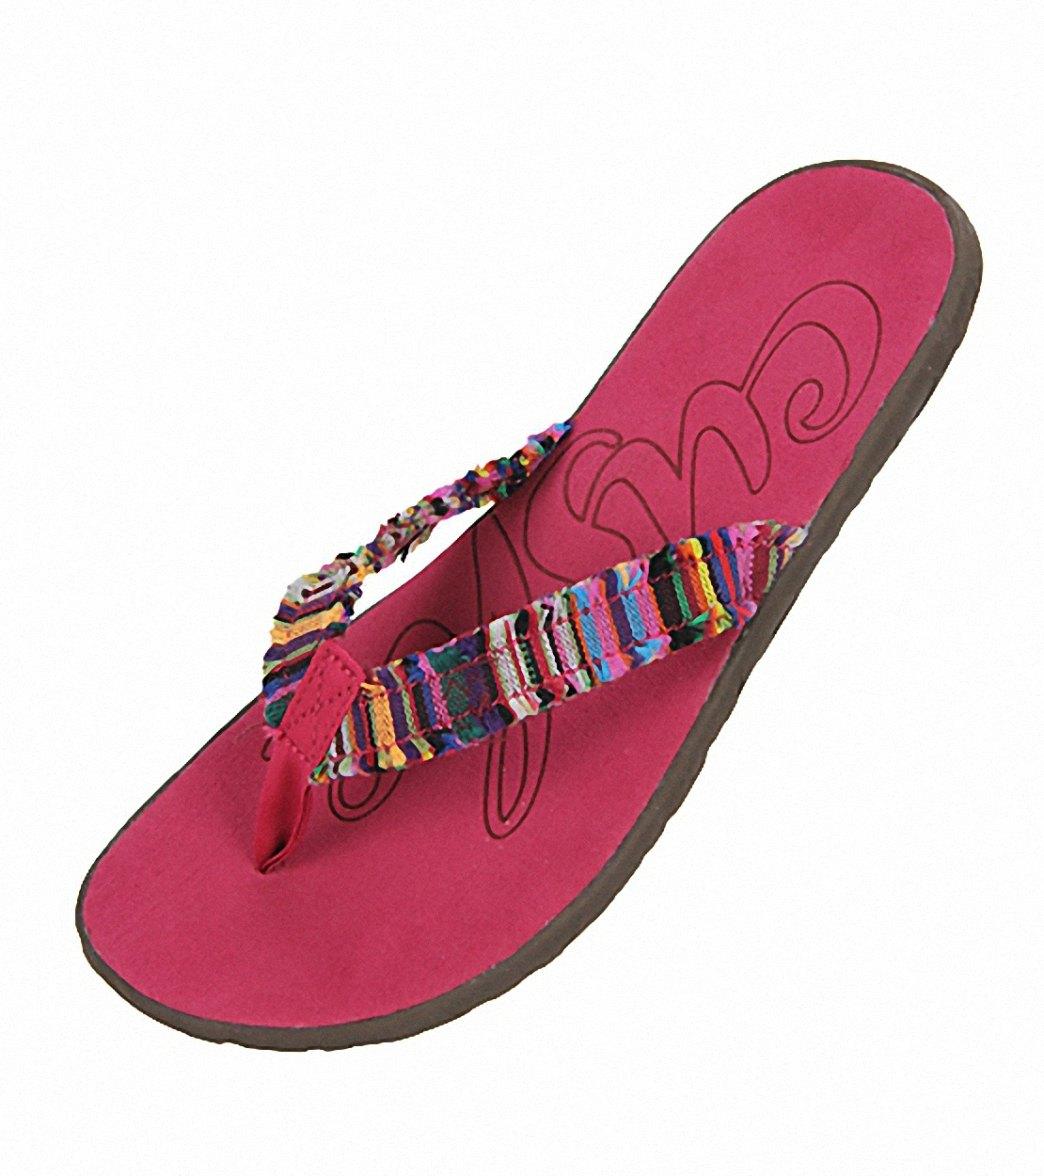 2e4eb69c9dff Cushe Women s Flipper Flip Flop at SwimOutlet.com